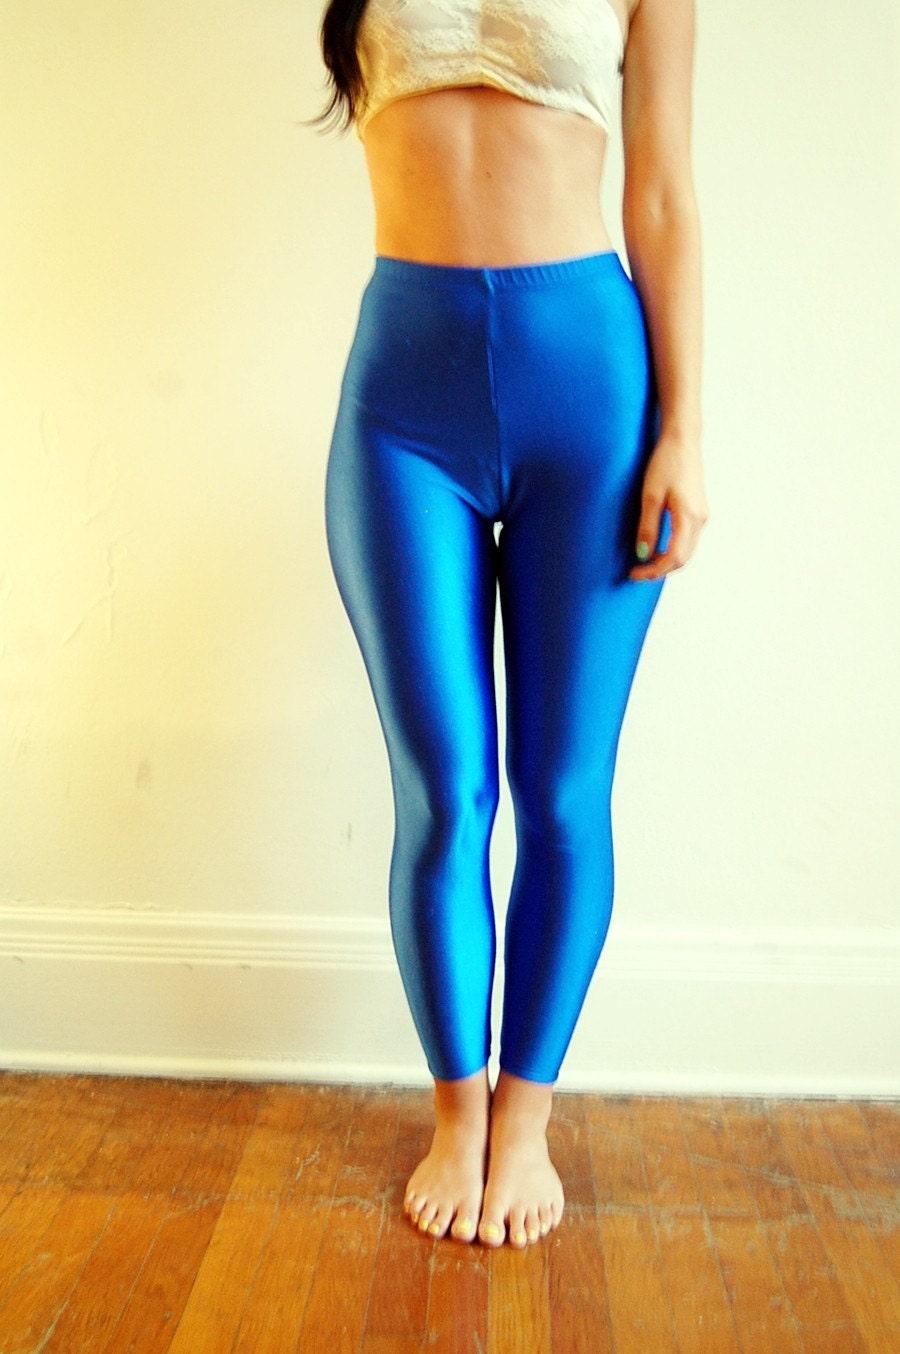 Blue Spandex Leggings